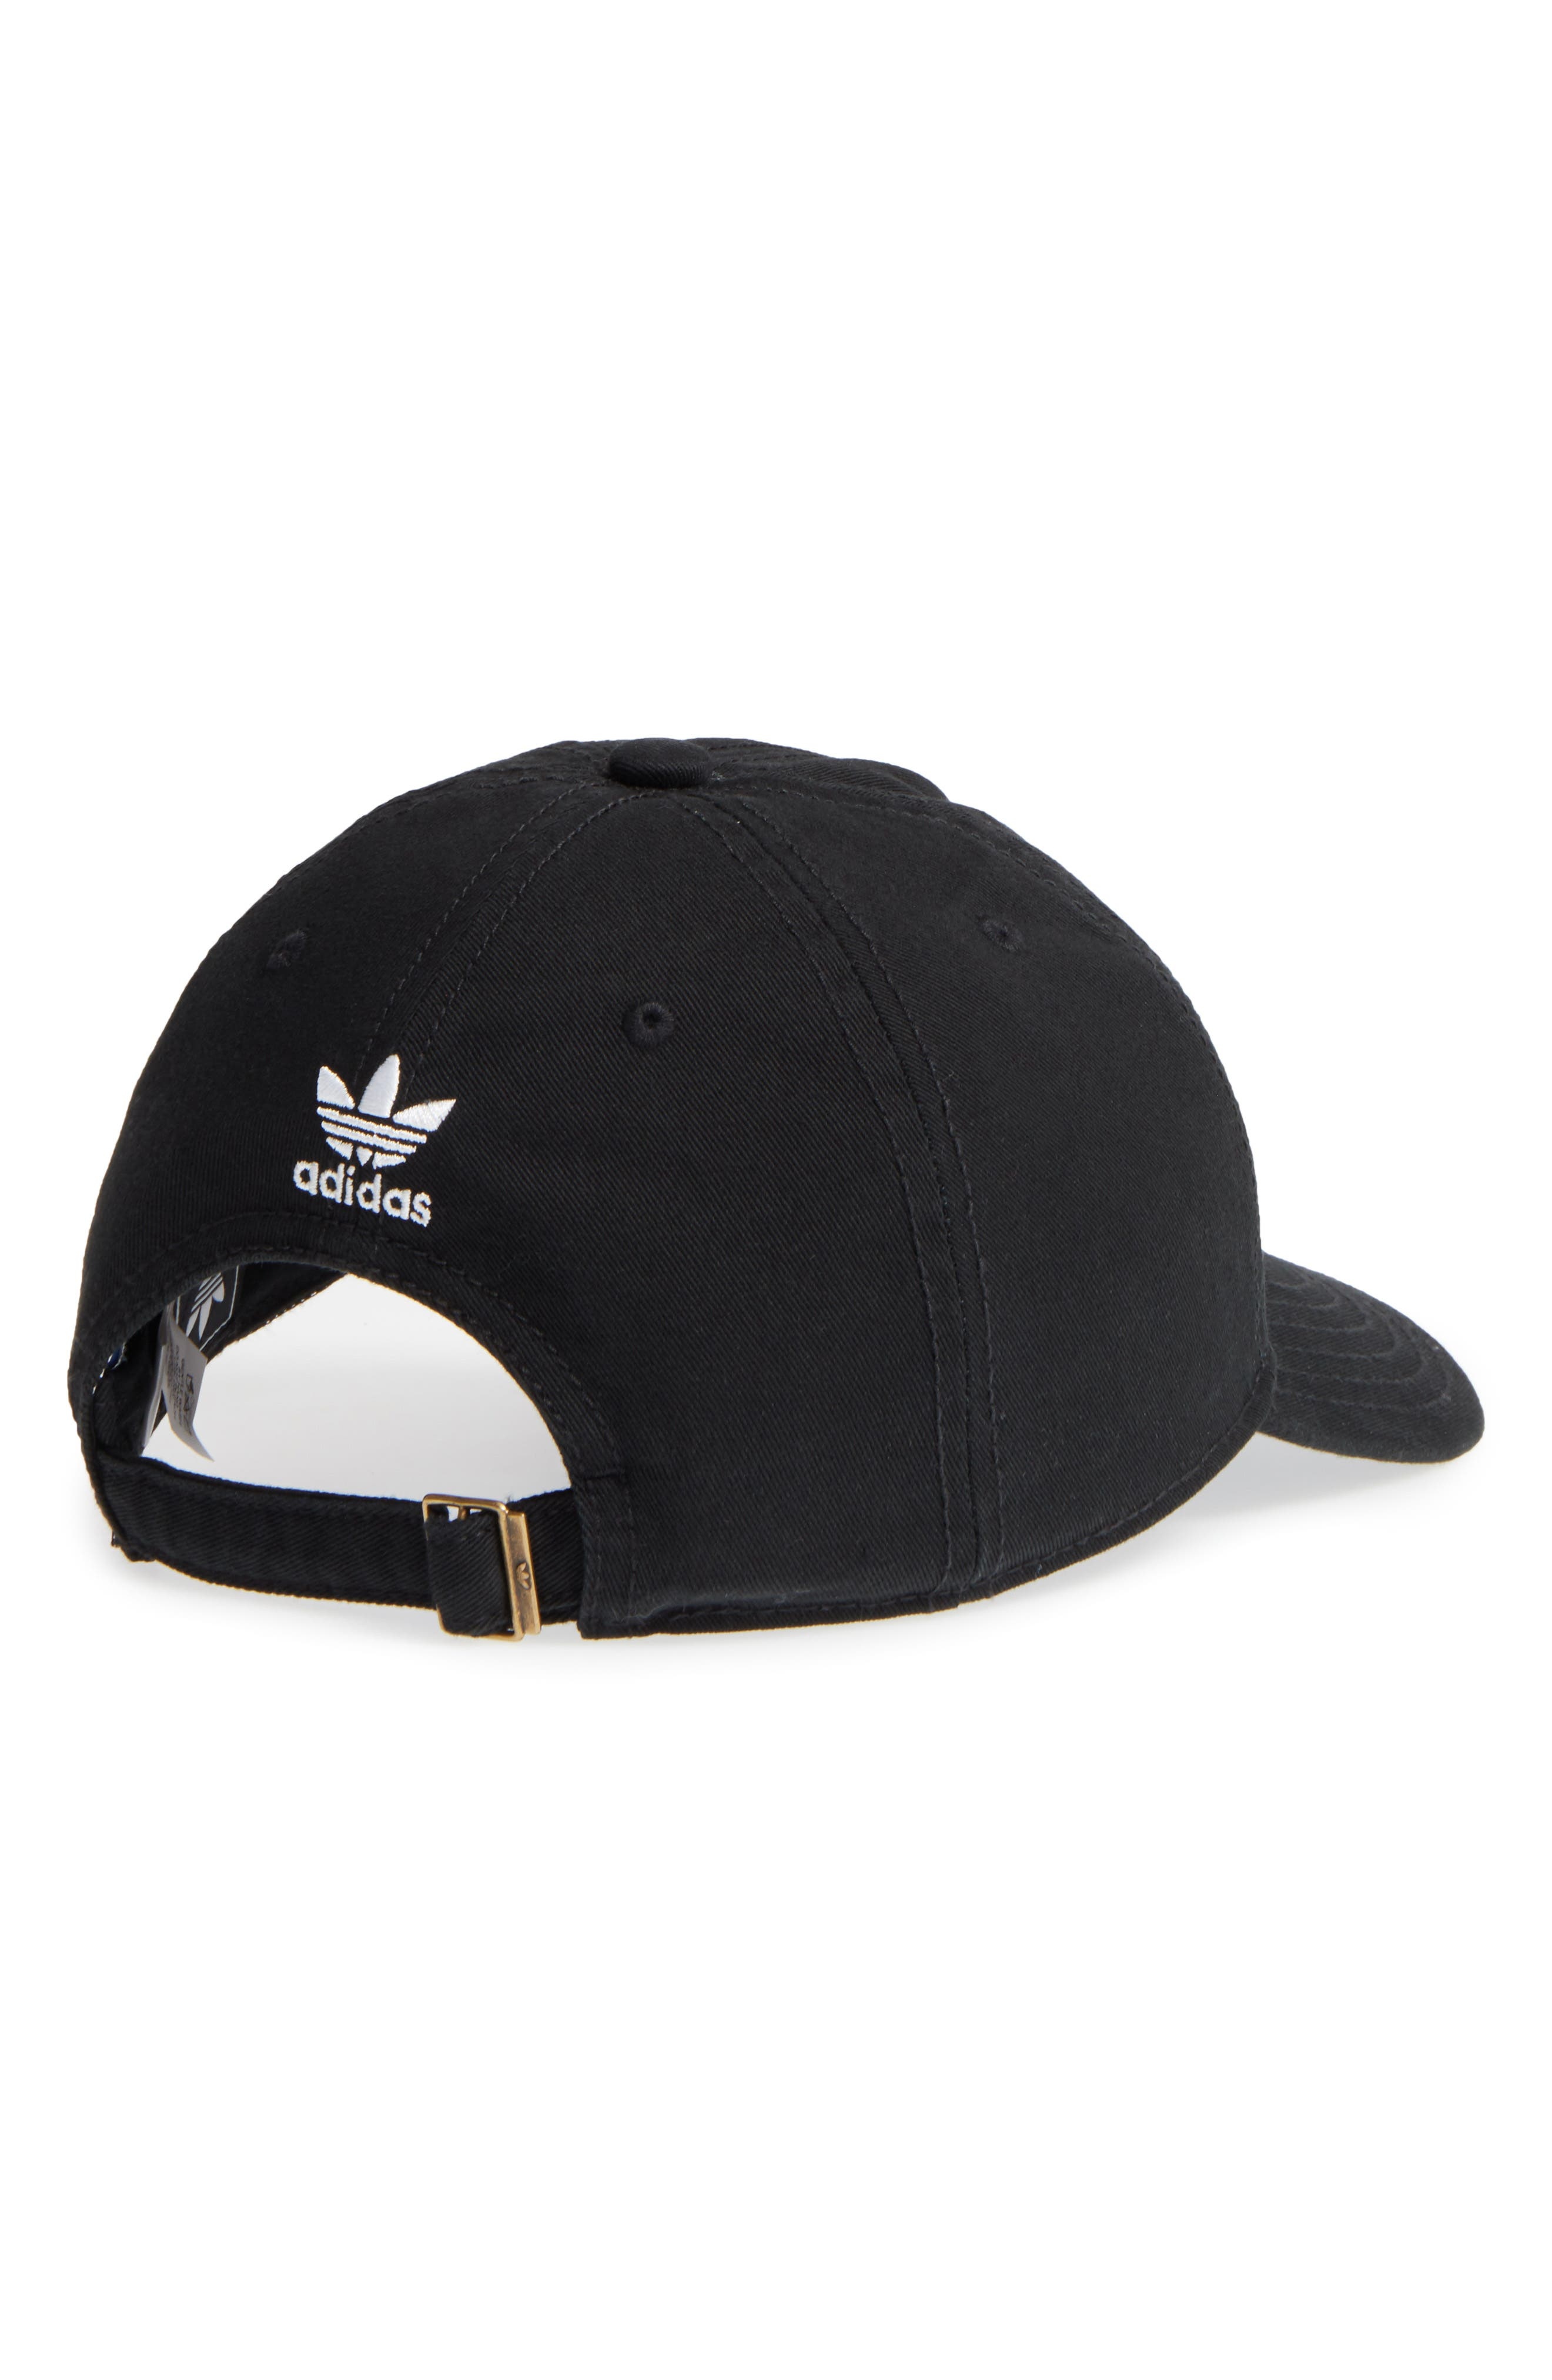 36e2eb294da Baseball Caps